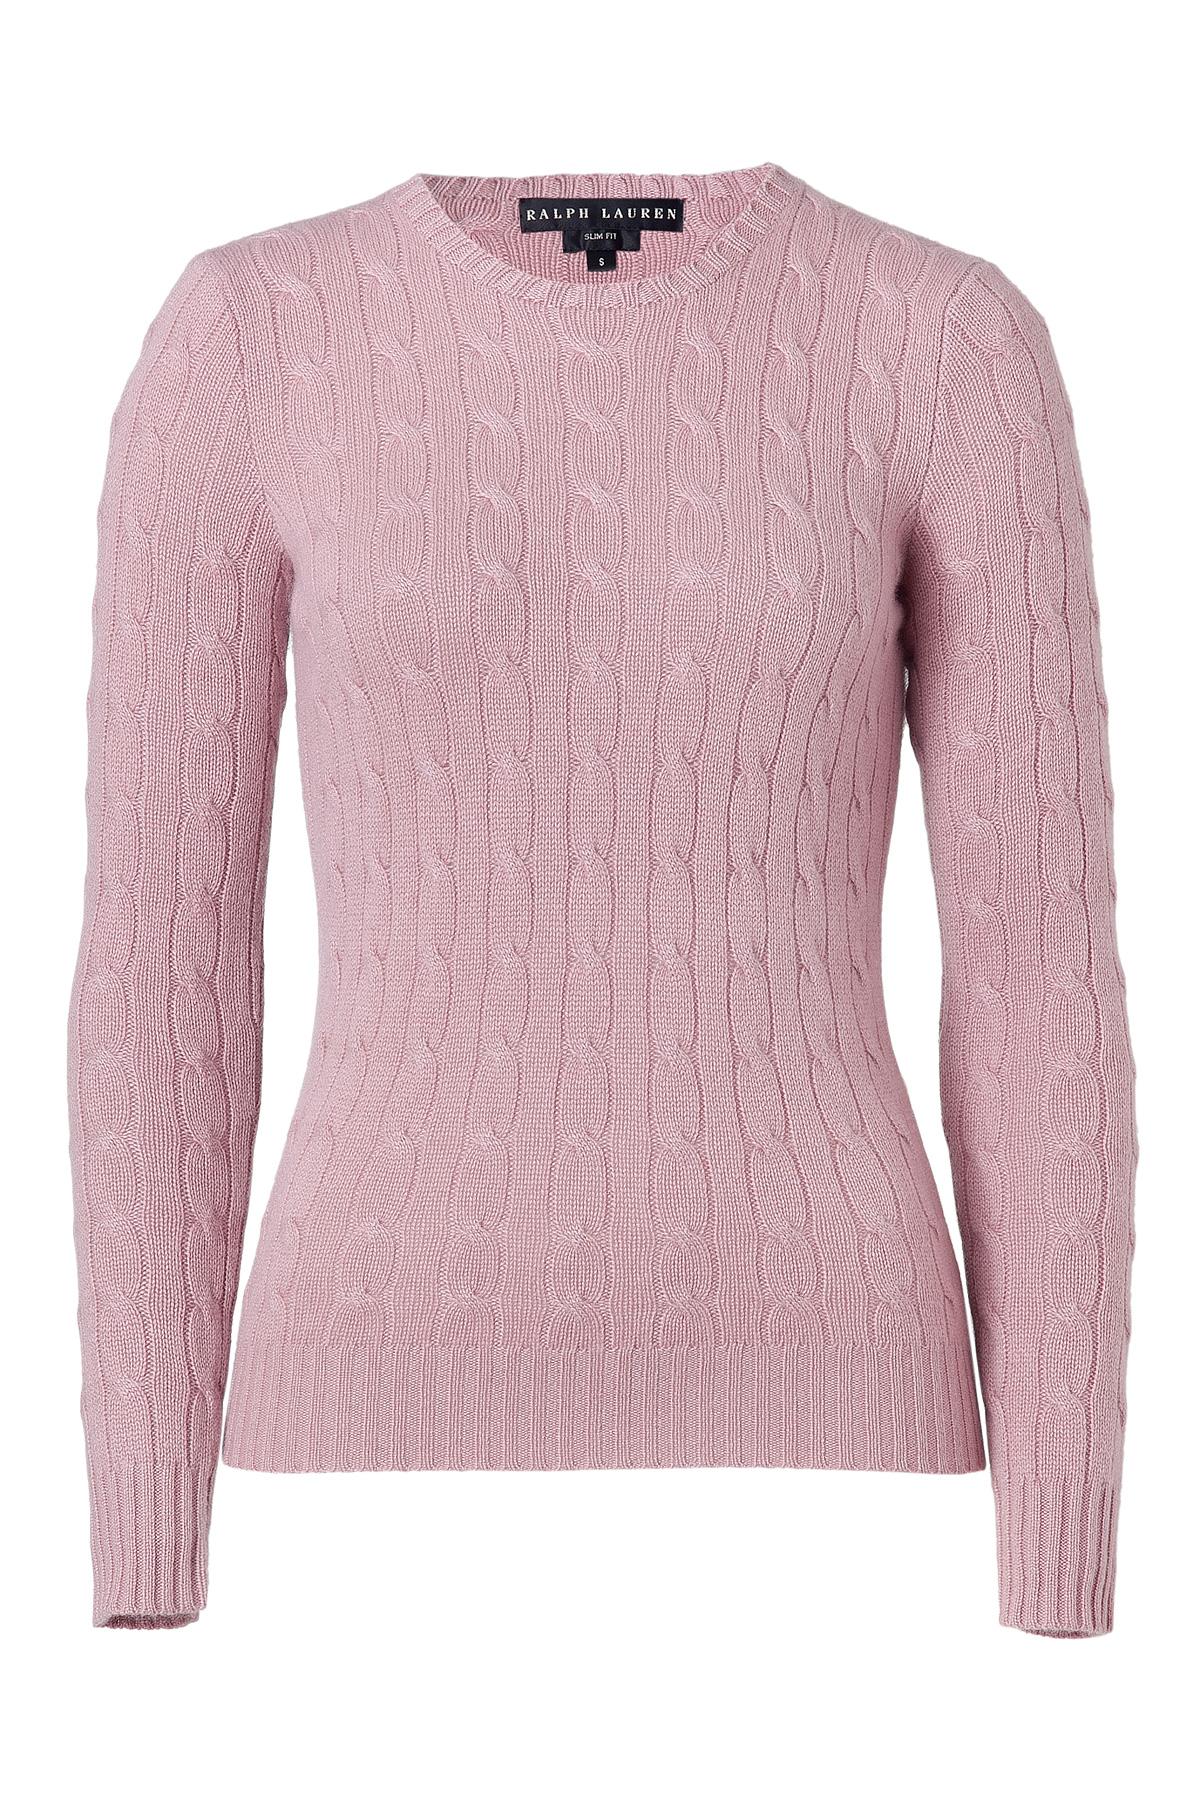 ralph lauren soft pink cashmere cable pullover in pink lyst. Black Bedroom Furniture Sets. Home Design Ideas